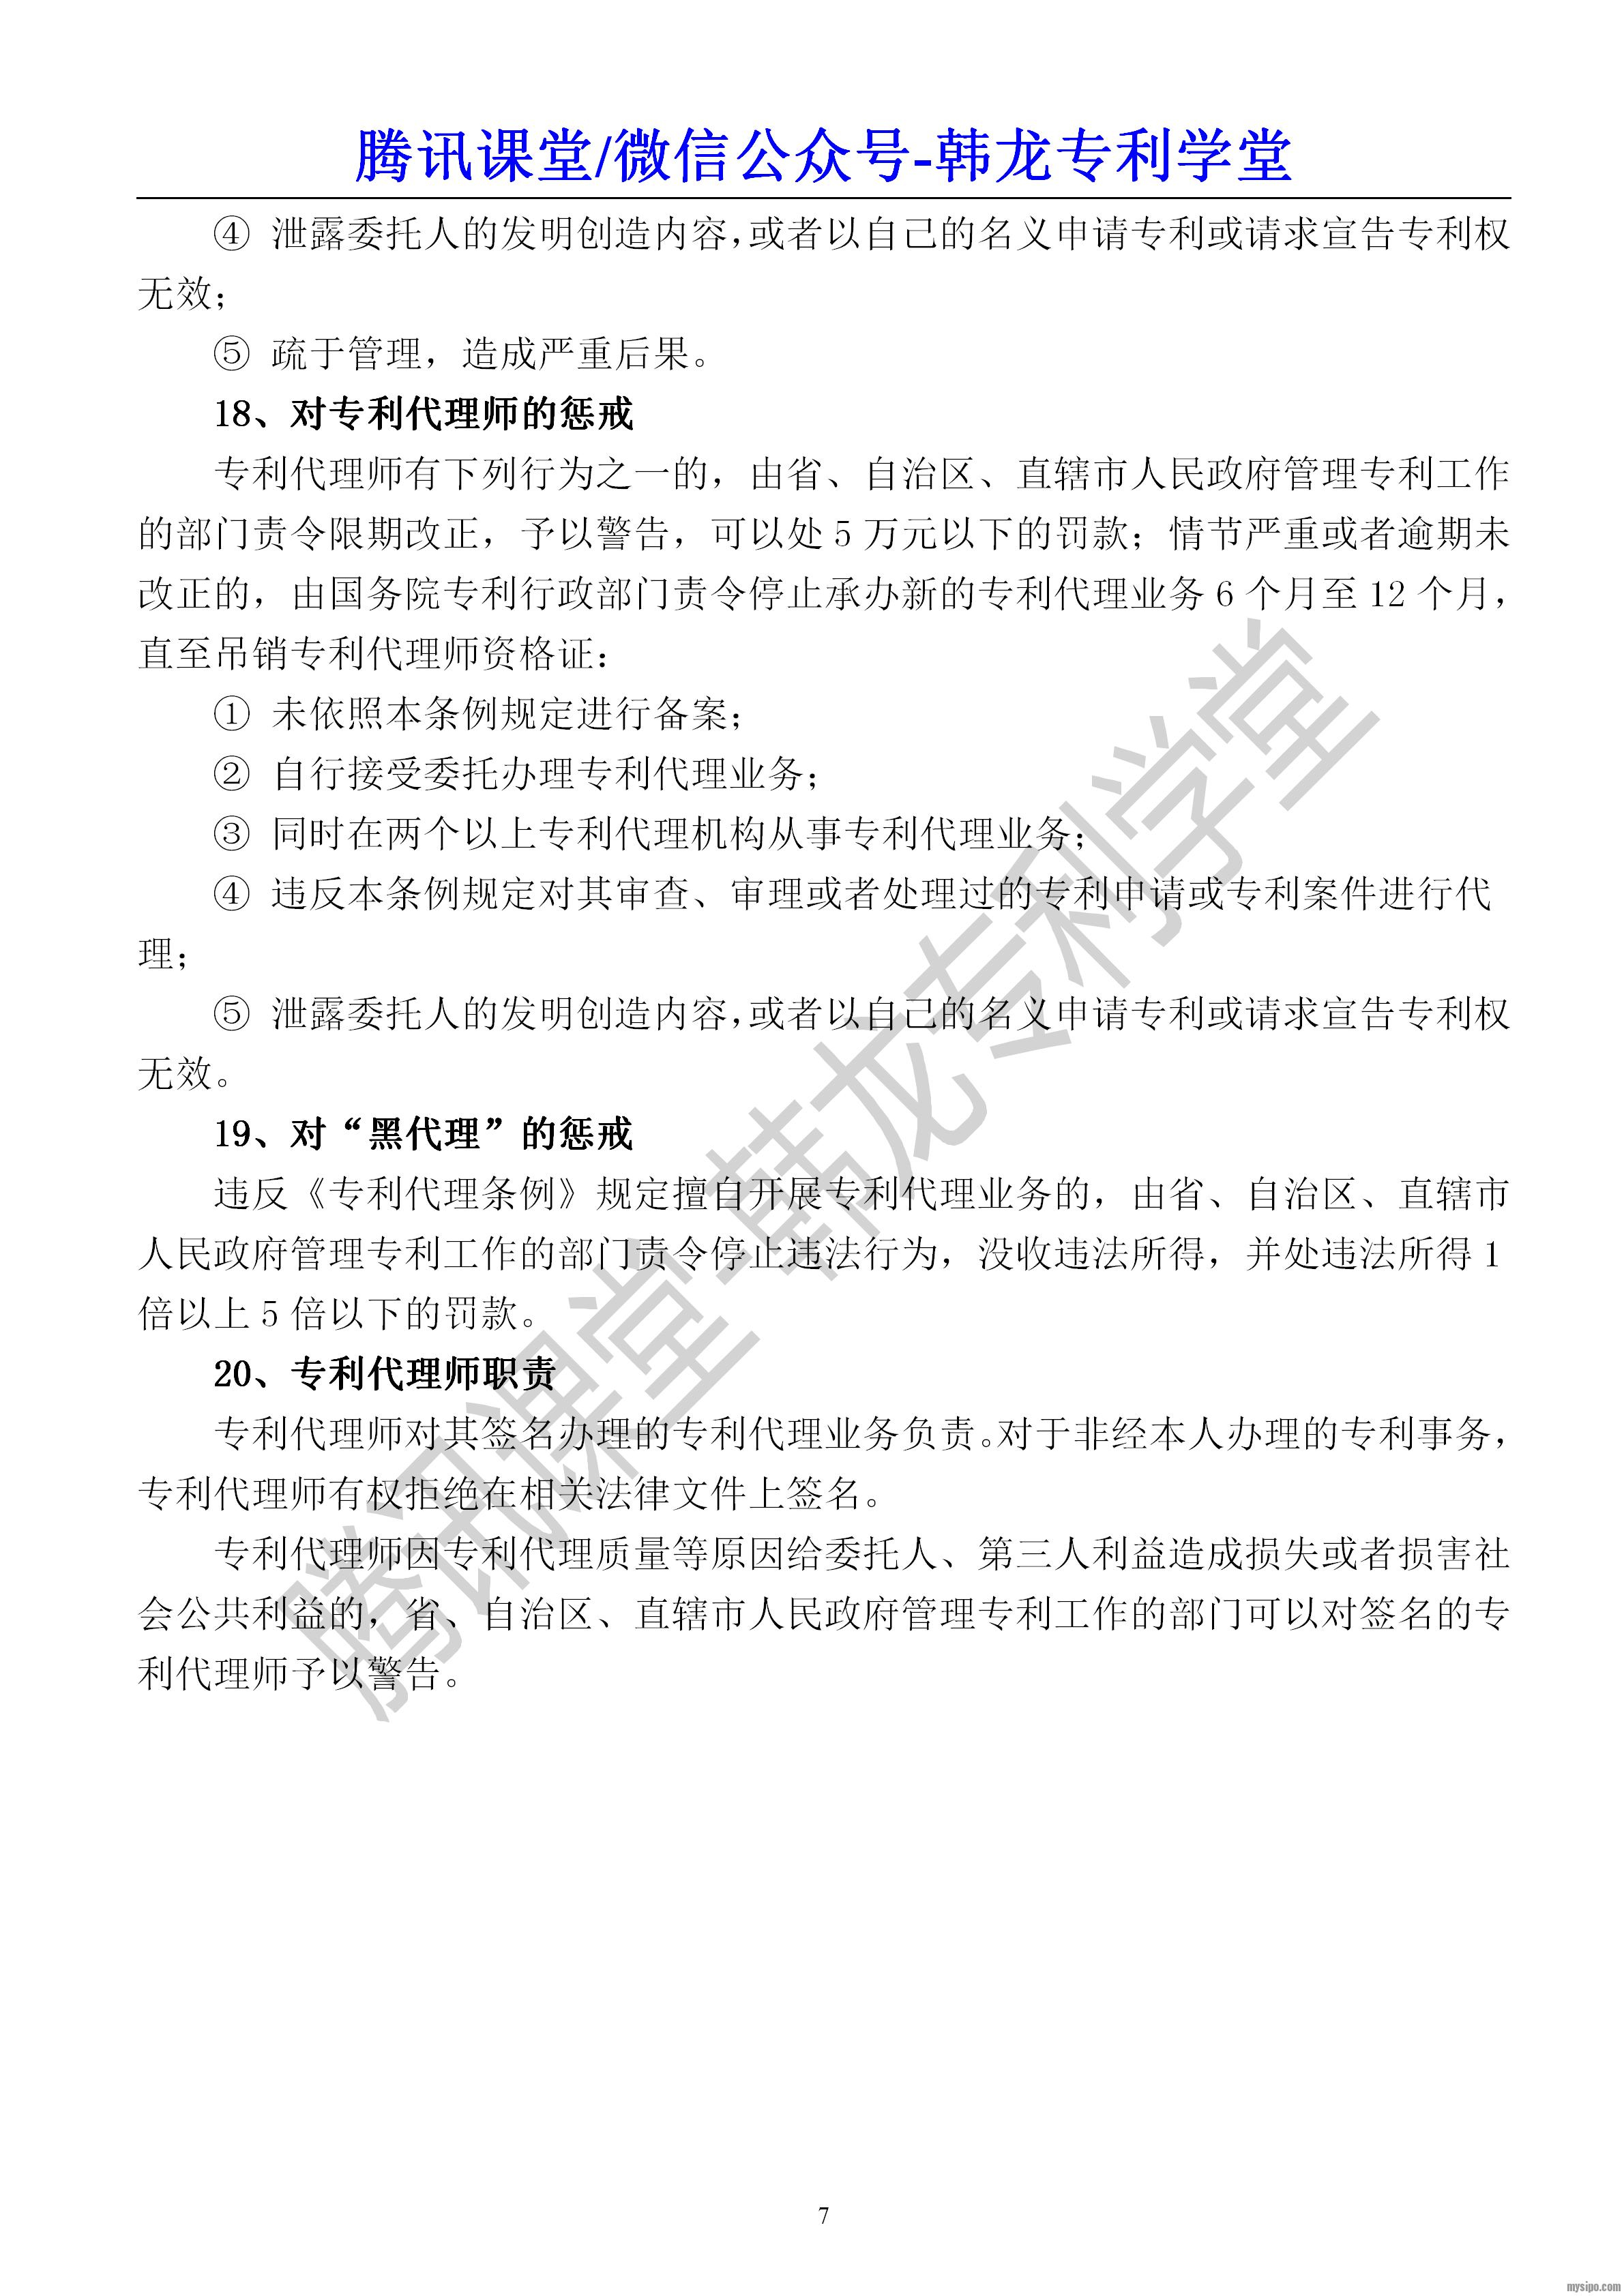 专利法_07.png